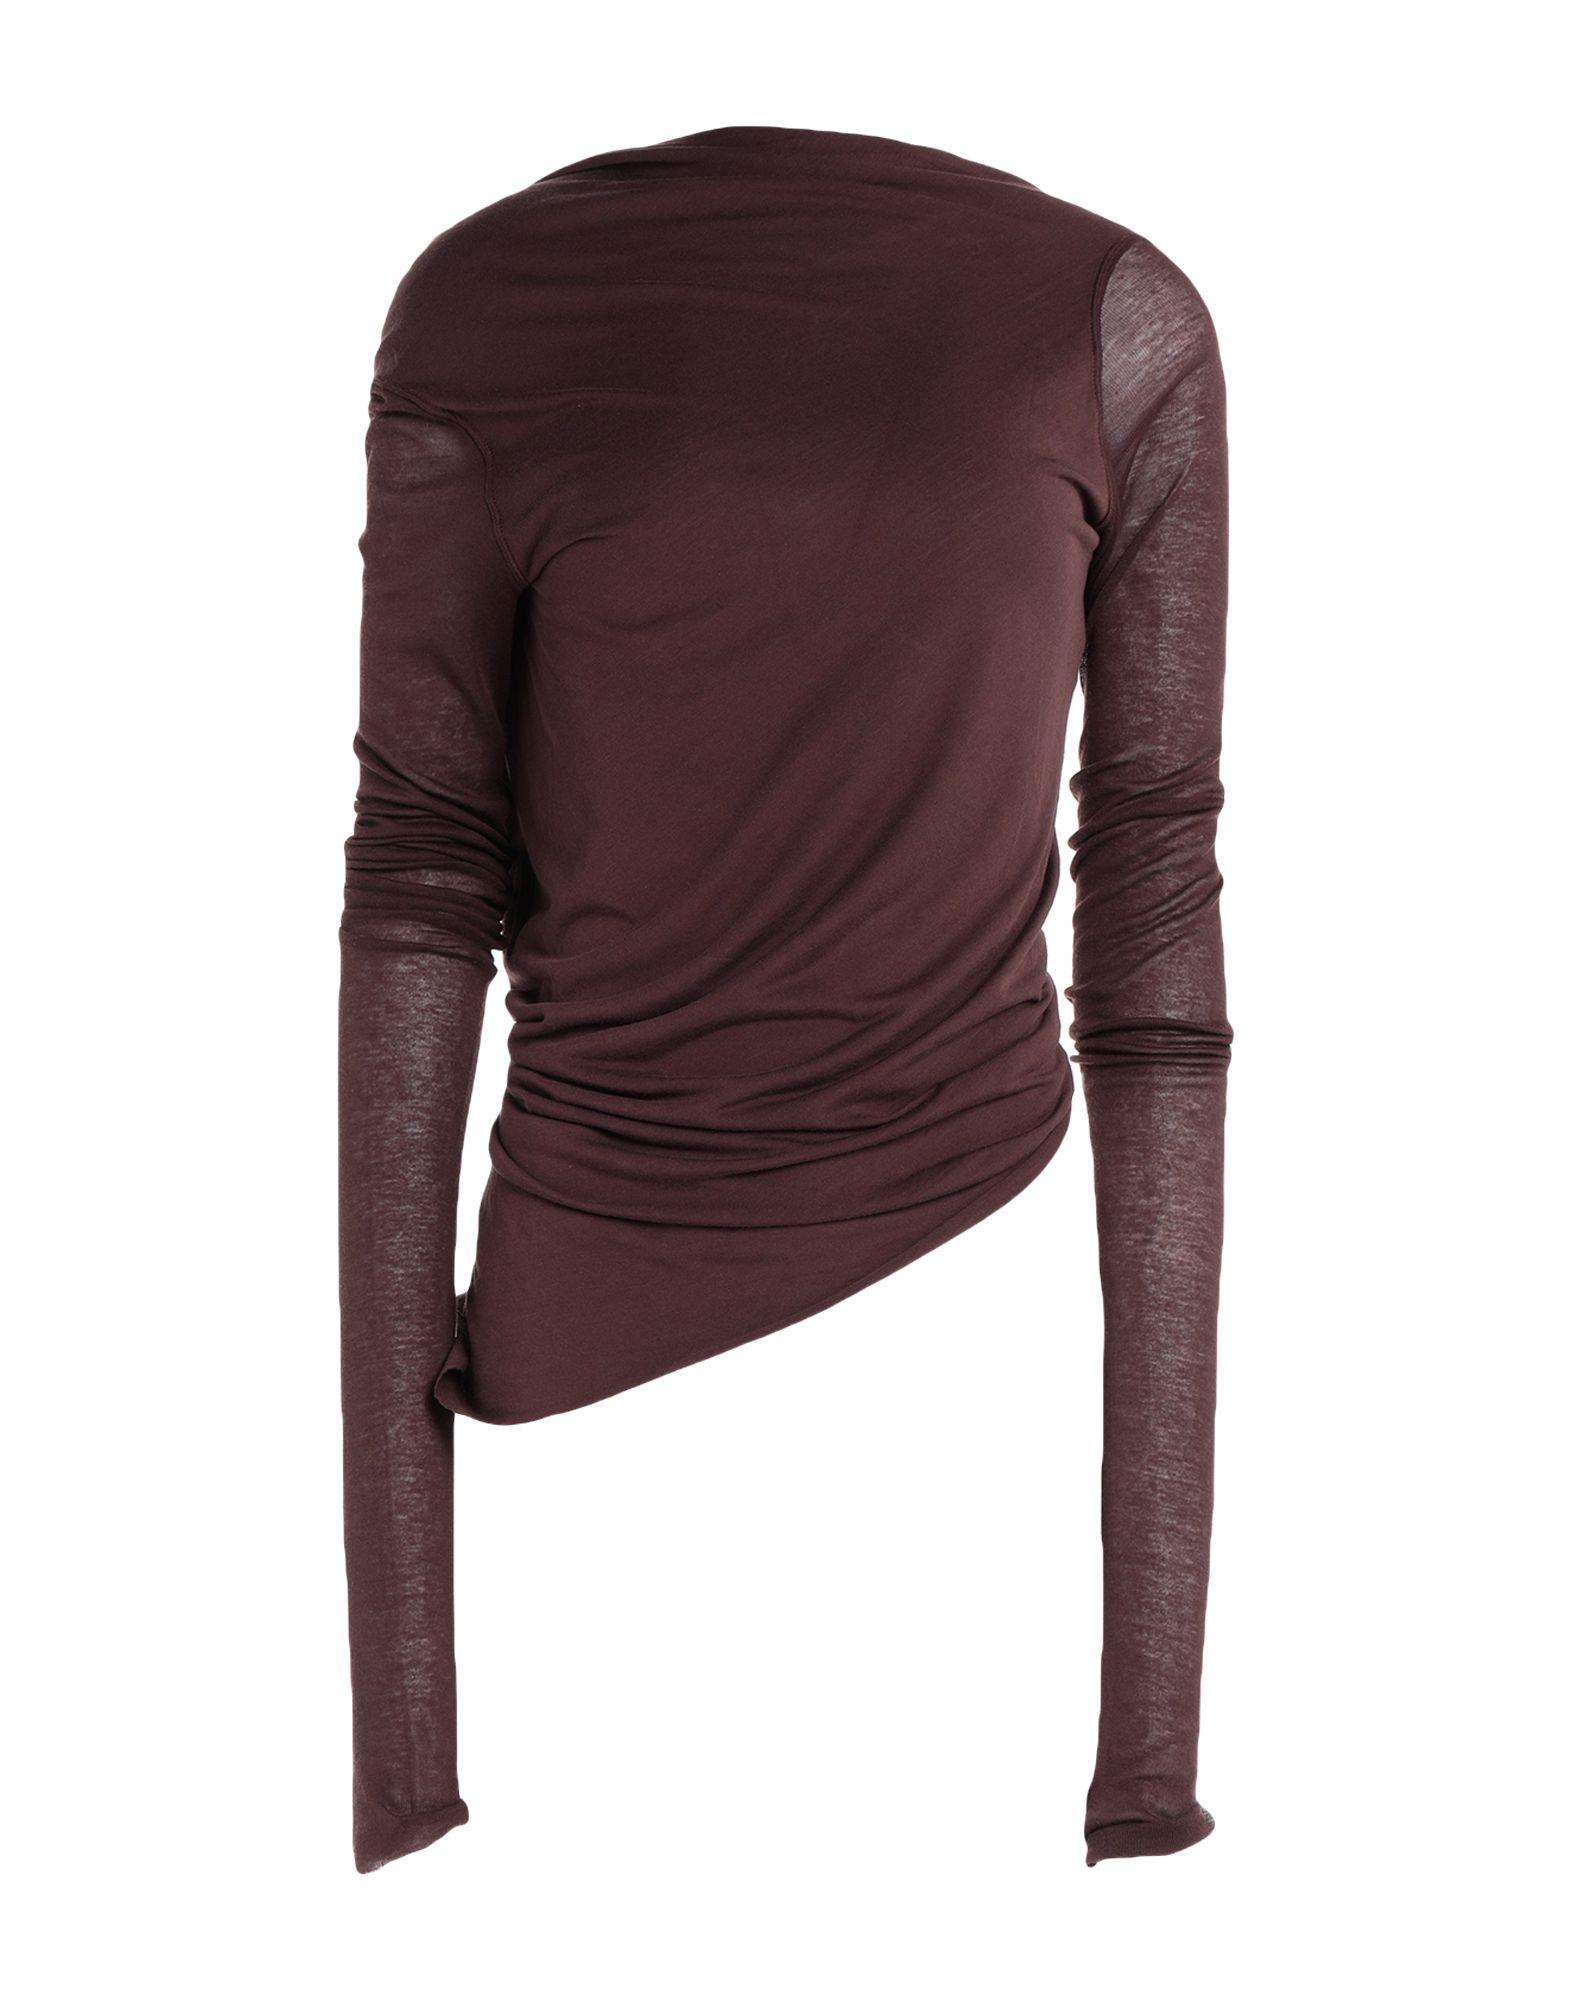 4cc4a703ee T-Shirt Rick damen - 12351639ST Owens Lilies nsrves9466-RICK OWENS ...